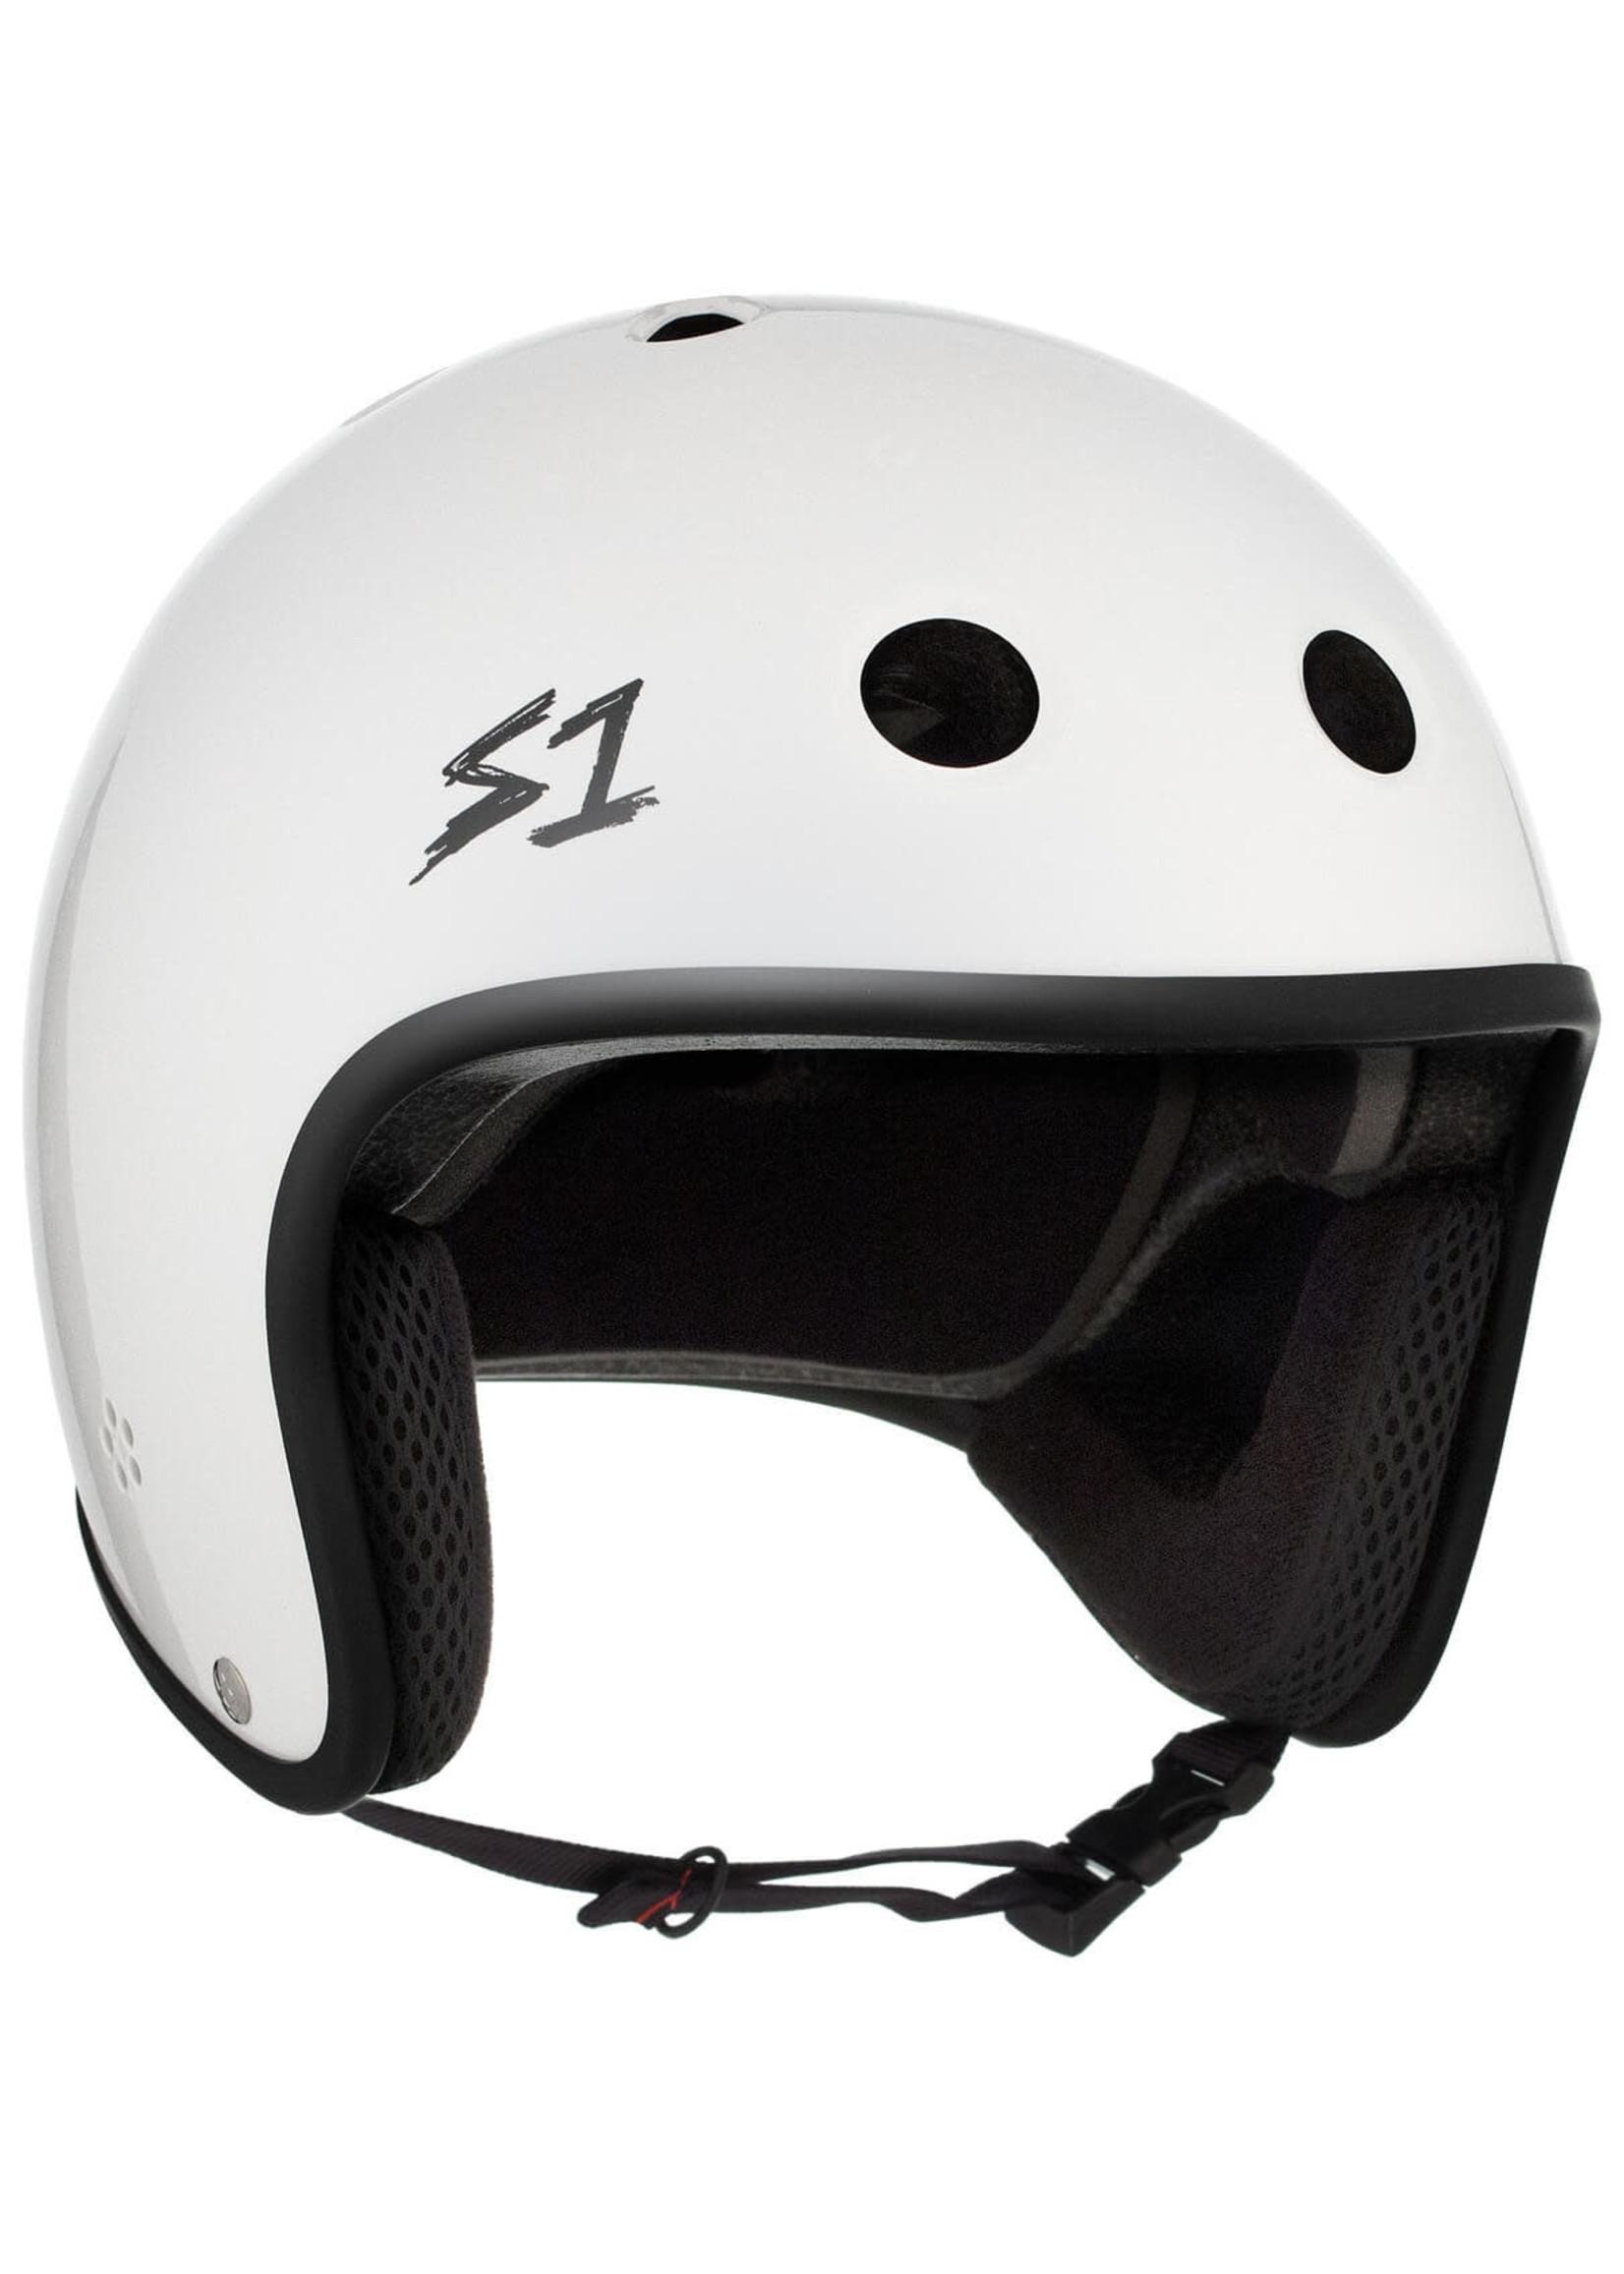 S1 S1 - Lifer Retro